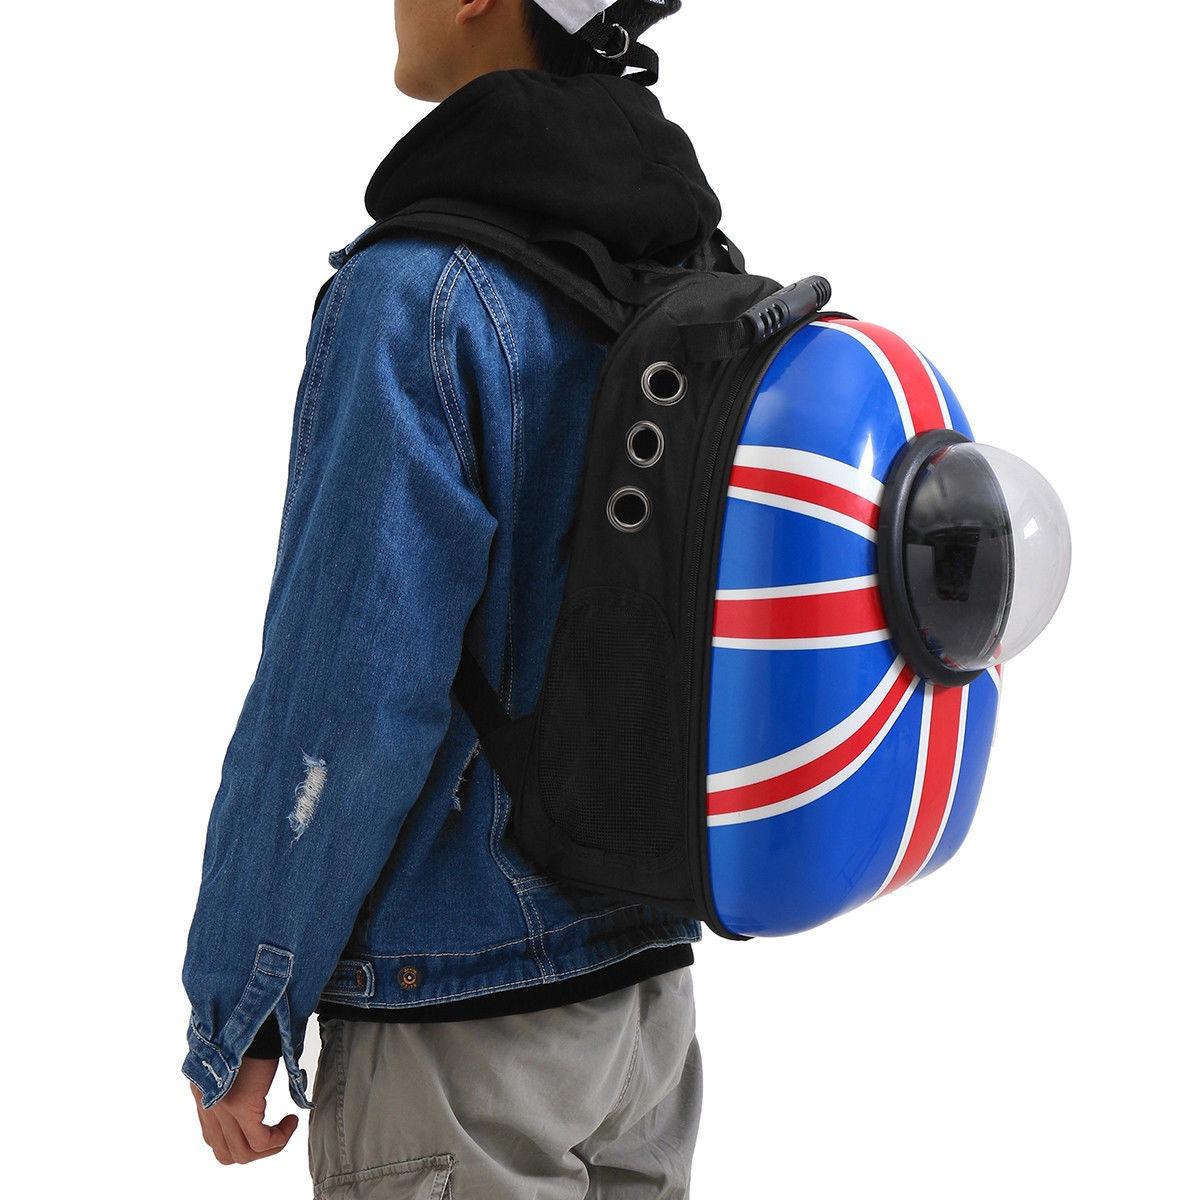 d964fb695616 mochila para transportar gato perro mascota bolsa llevar pet. Cargando zoom.